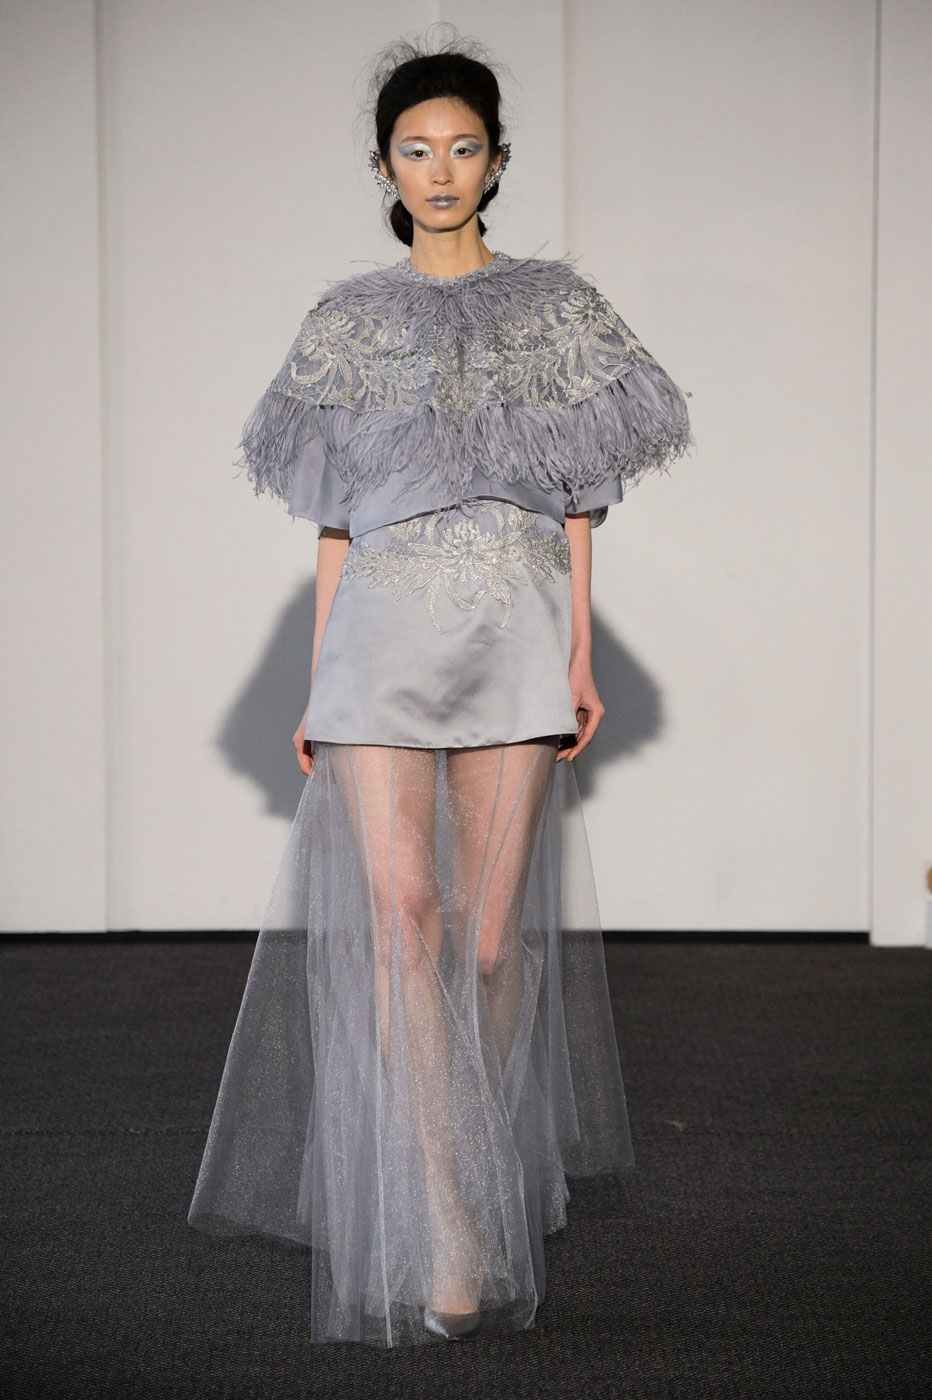 Busardi-fashion-runway-show-haute-couture-paris-spring-2015-the-impression-64